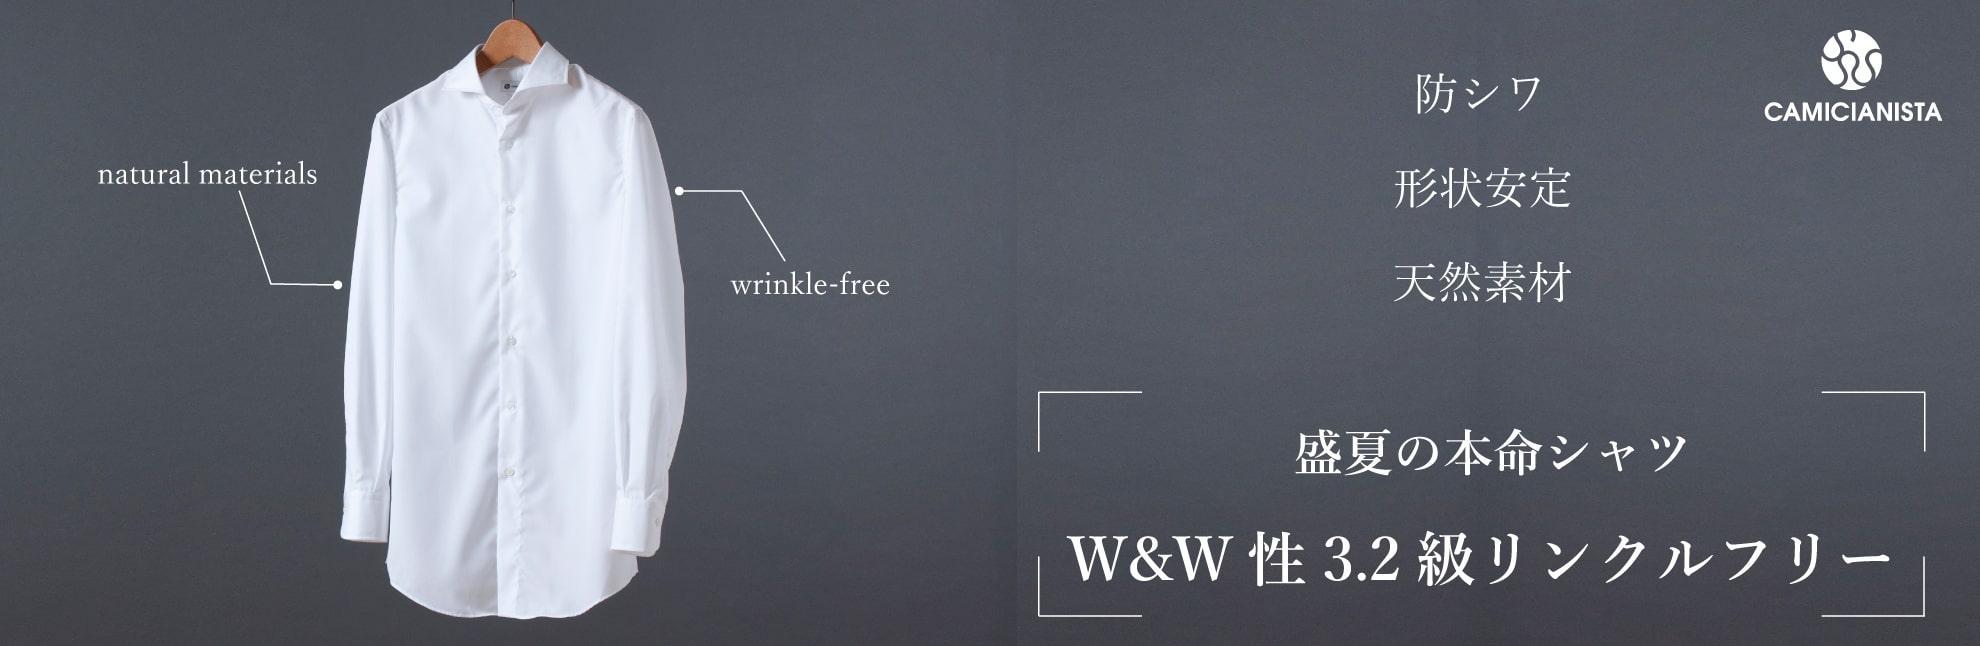 wrinklefree CAMICIANISTA(カミチャニスタ)